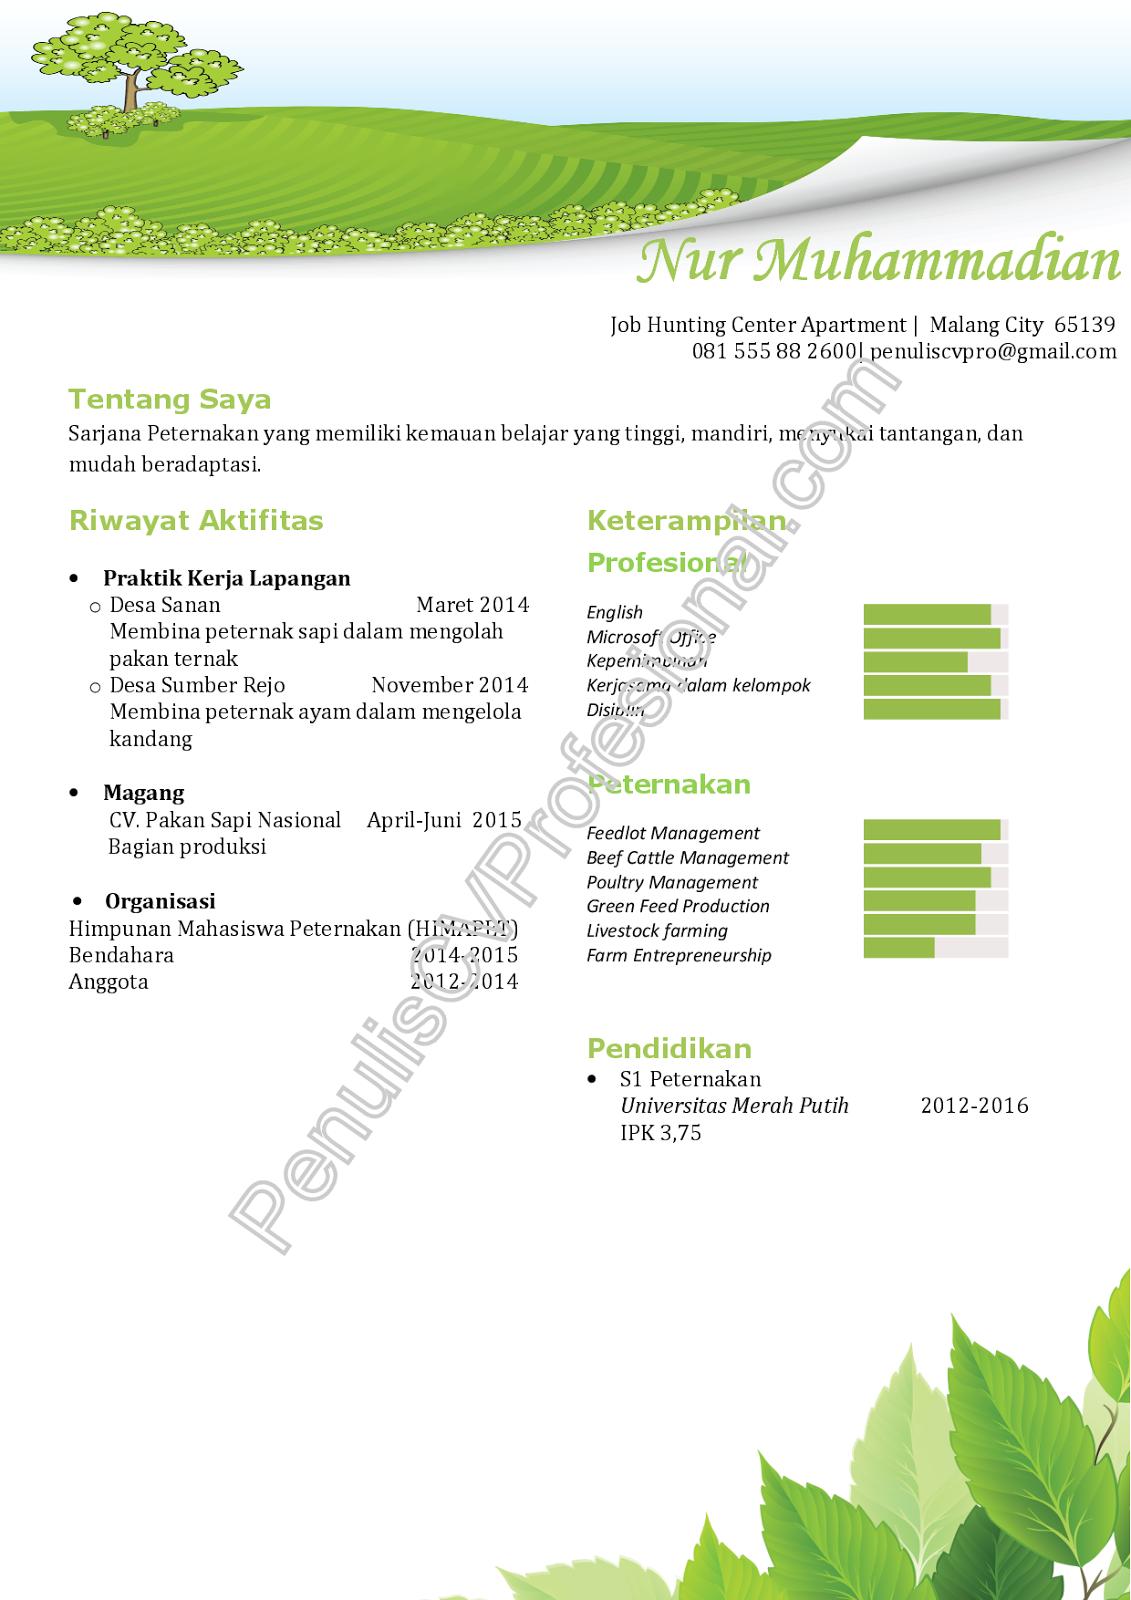 Job Hunting Center Contoh Curriculum Vitae Fresh Graduate Sarjana Peternakan